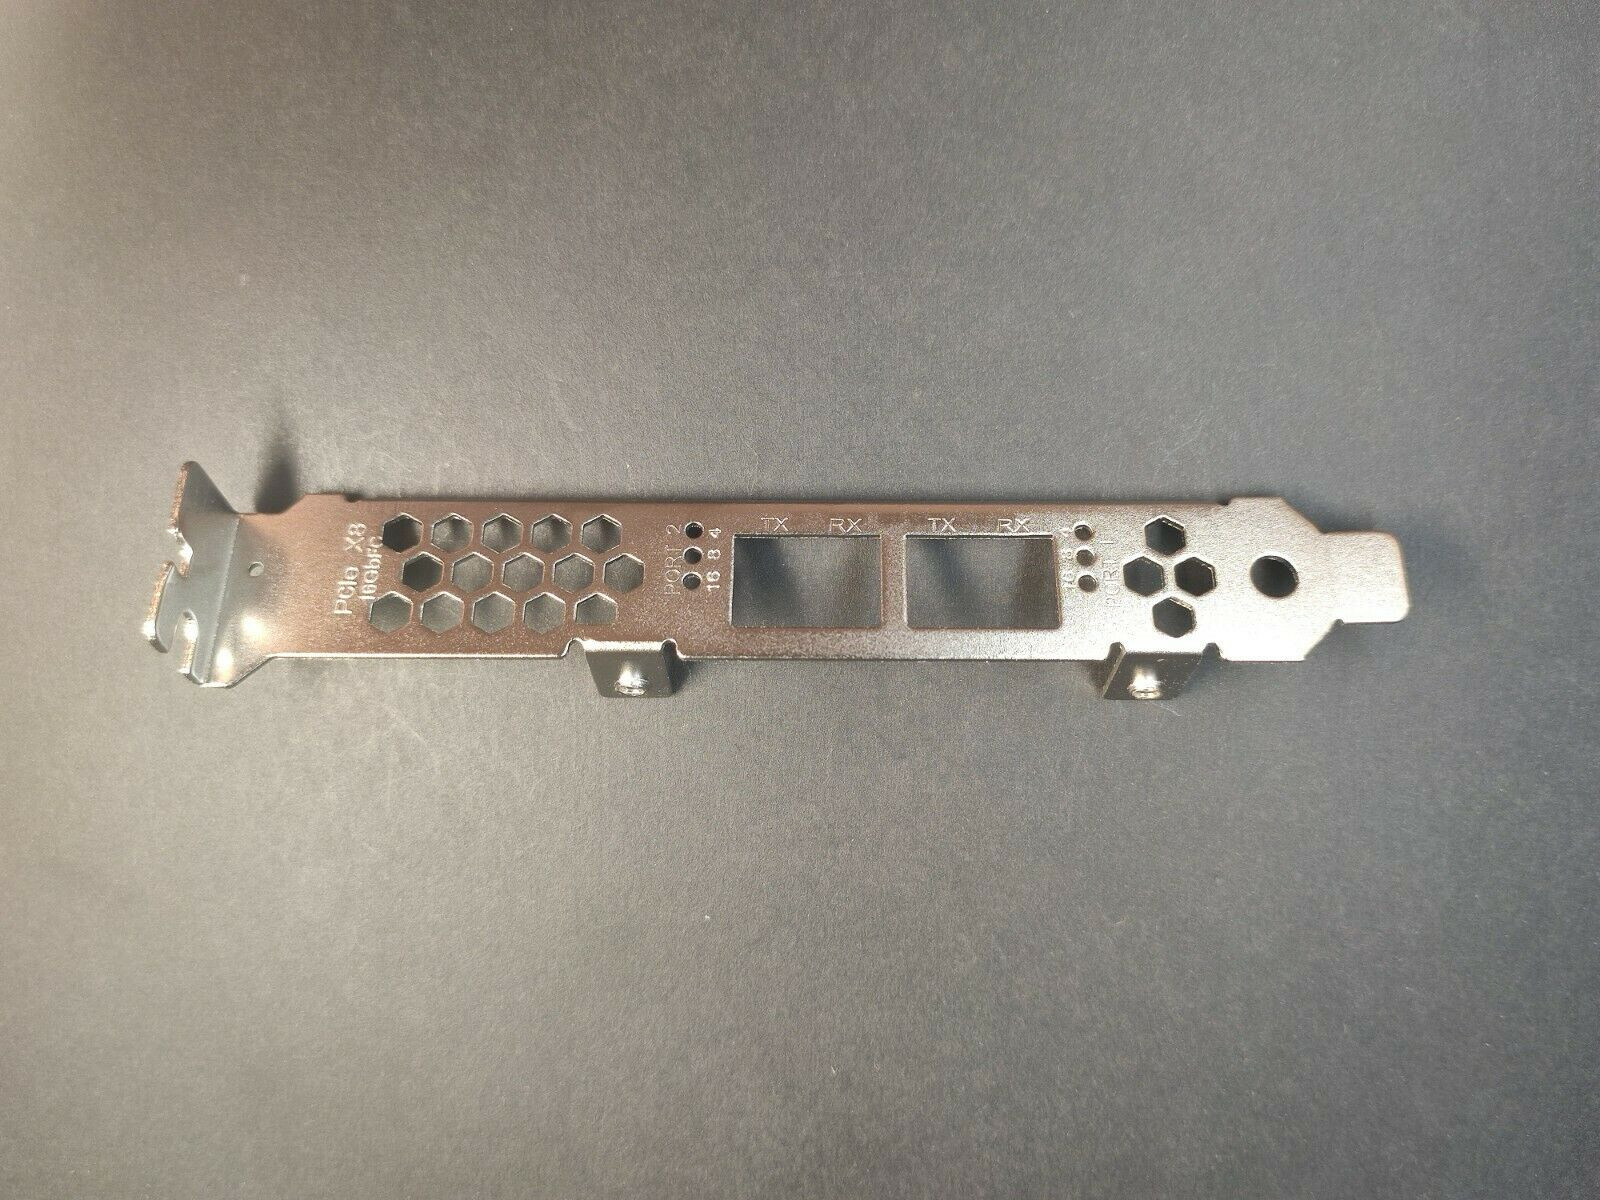 LONG STAND BRACKET for QLOGIC QLE2662 QLE2672 QLE2692 16GB HBA